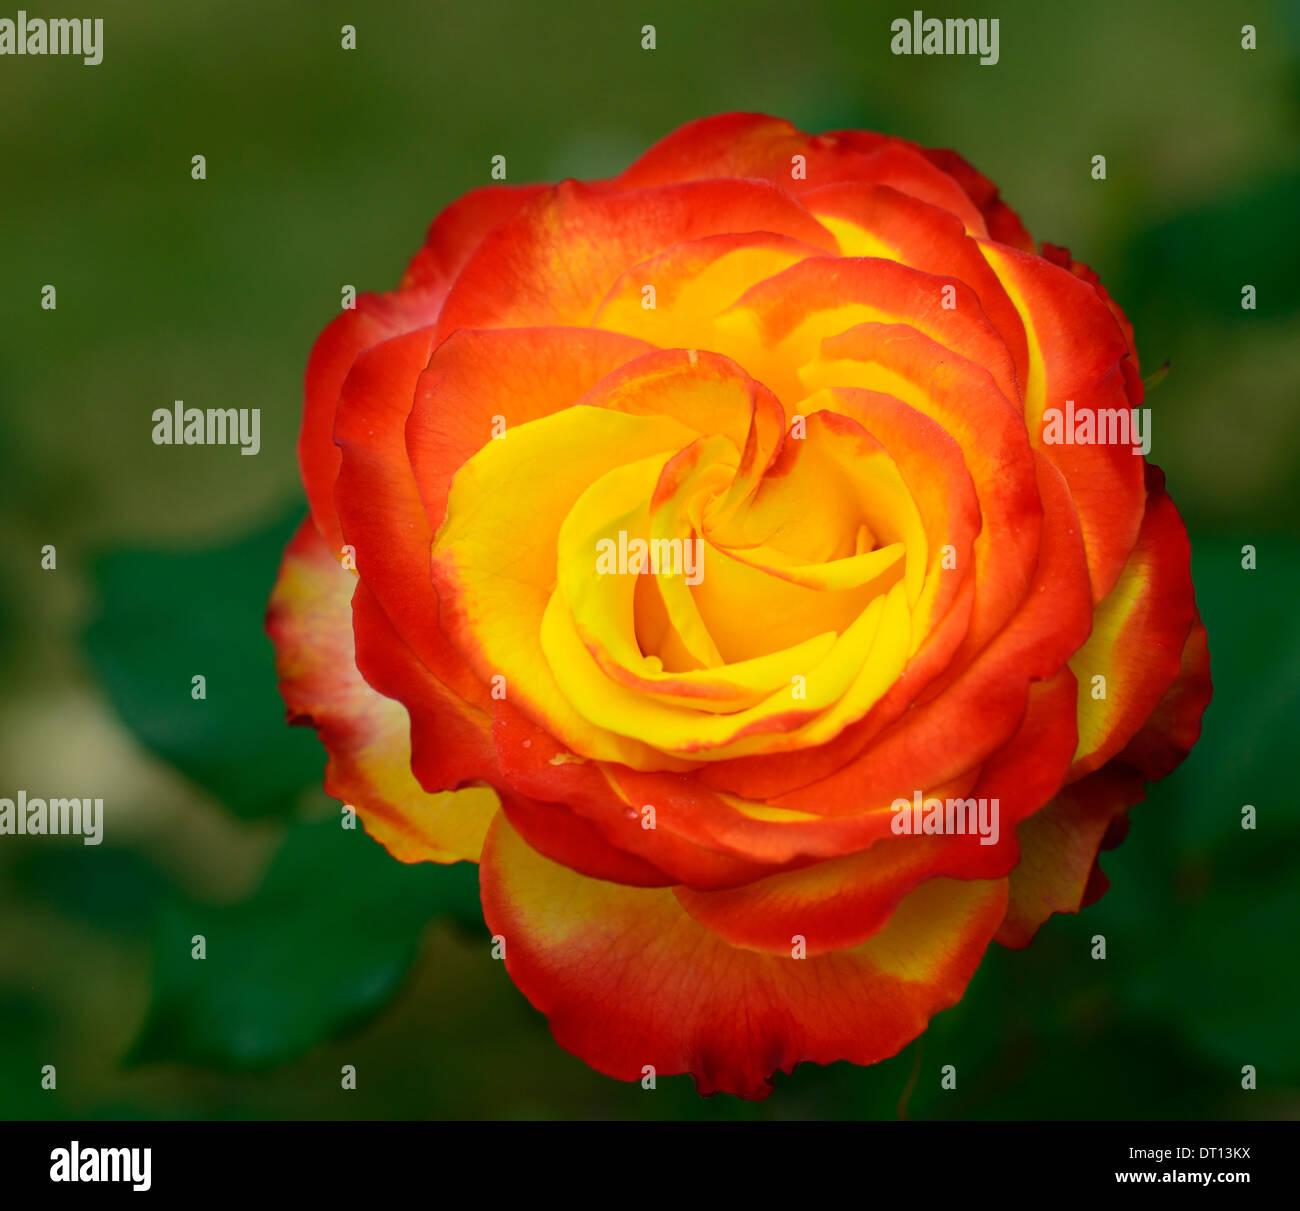 Rosa Strauchrose Tequila Sunrise Dicobey Rosen Orange Rot Gelb Blume